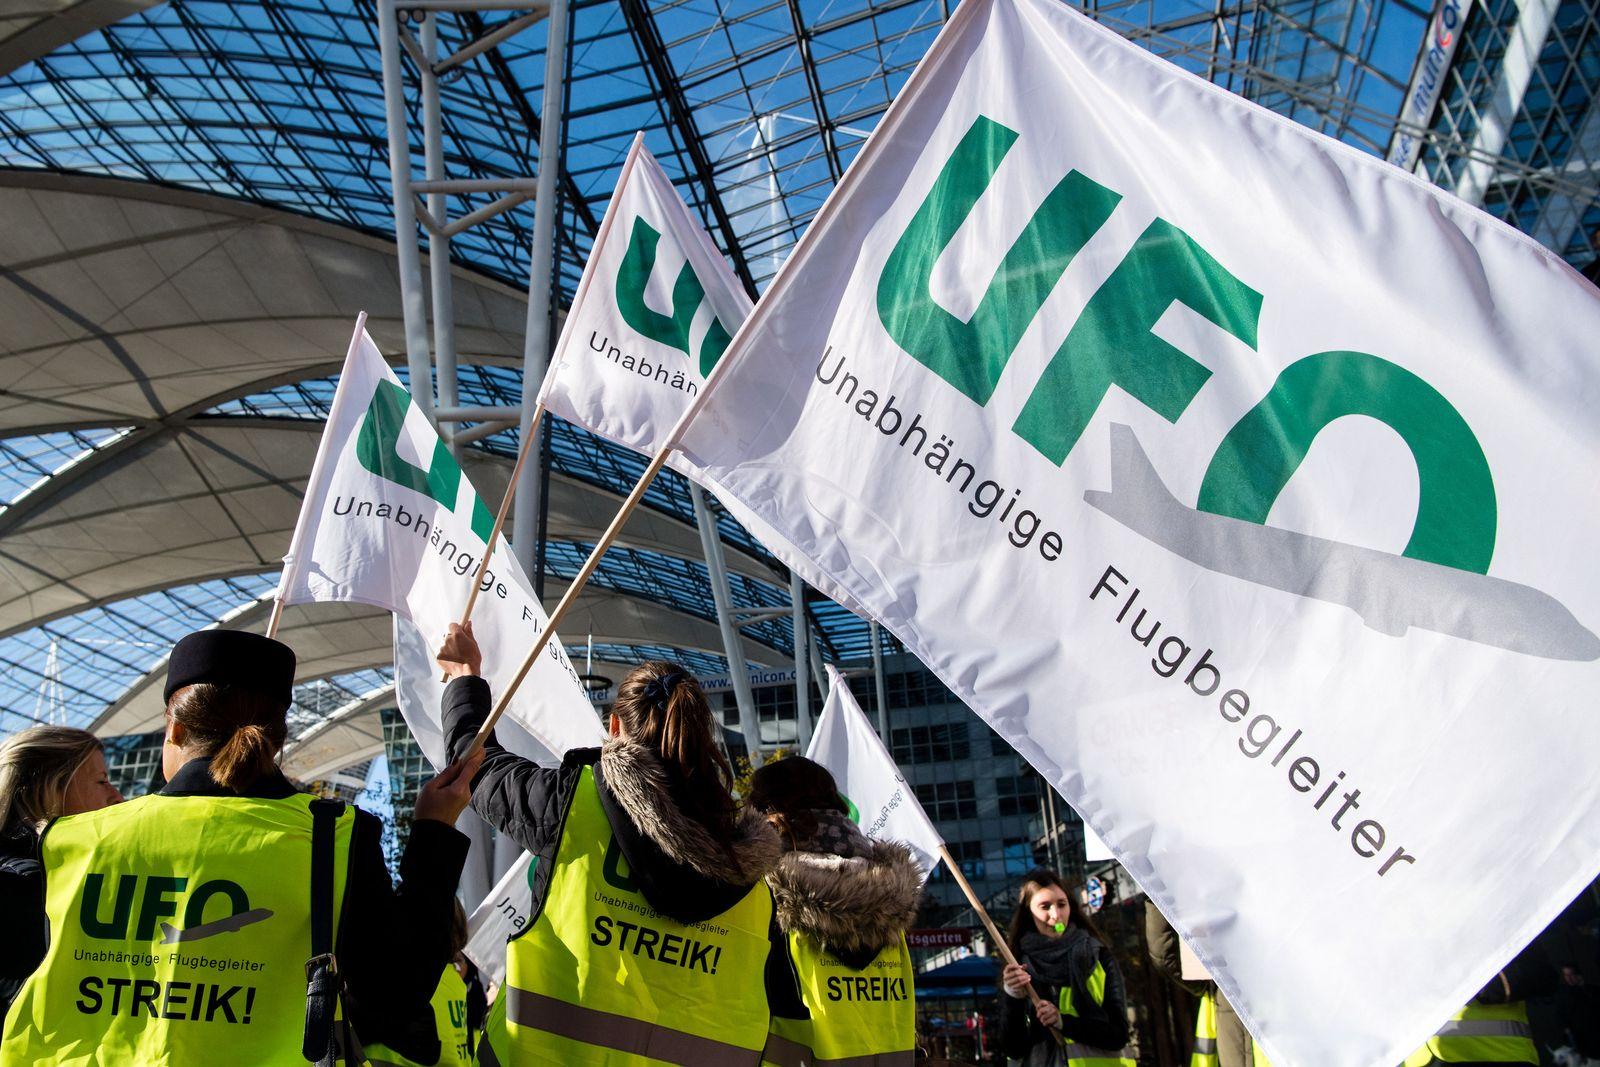 Flugbegleiter-Streik bei Lufthansa - Ufo